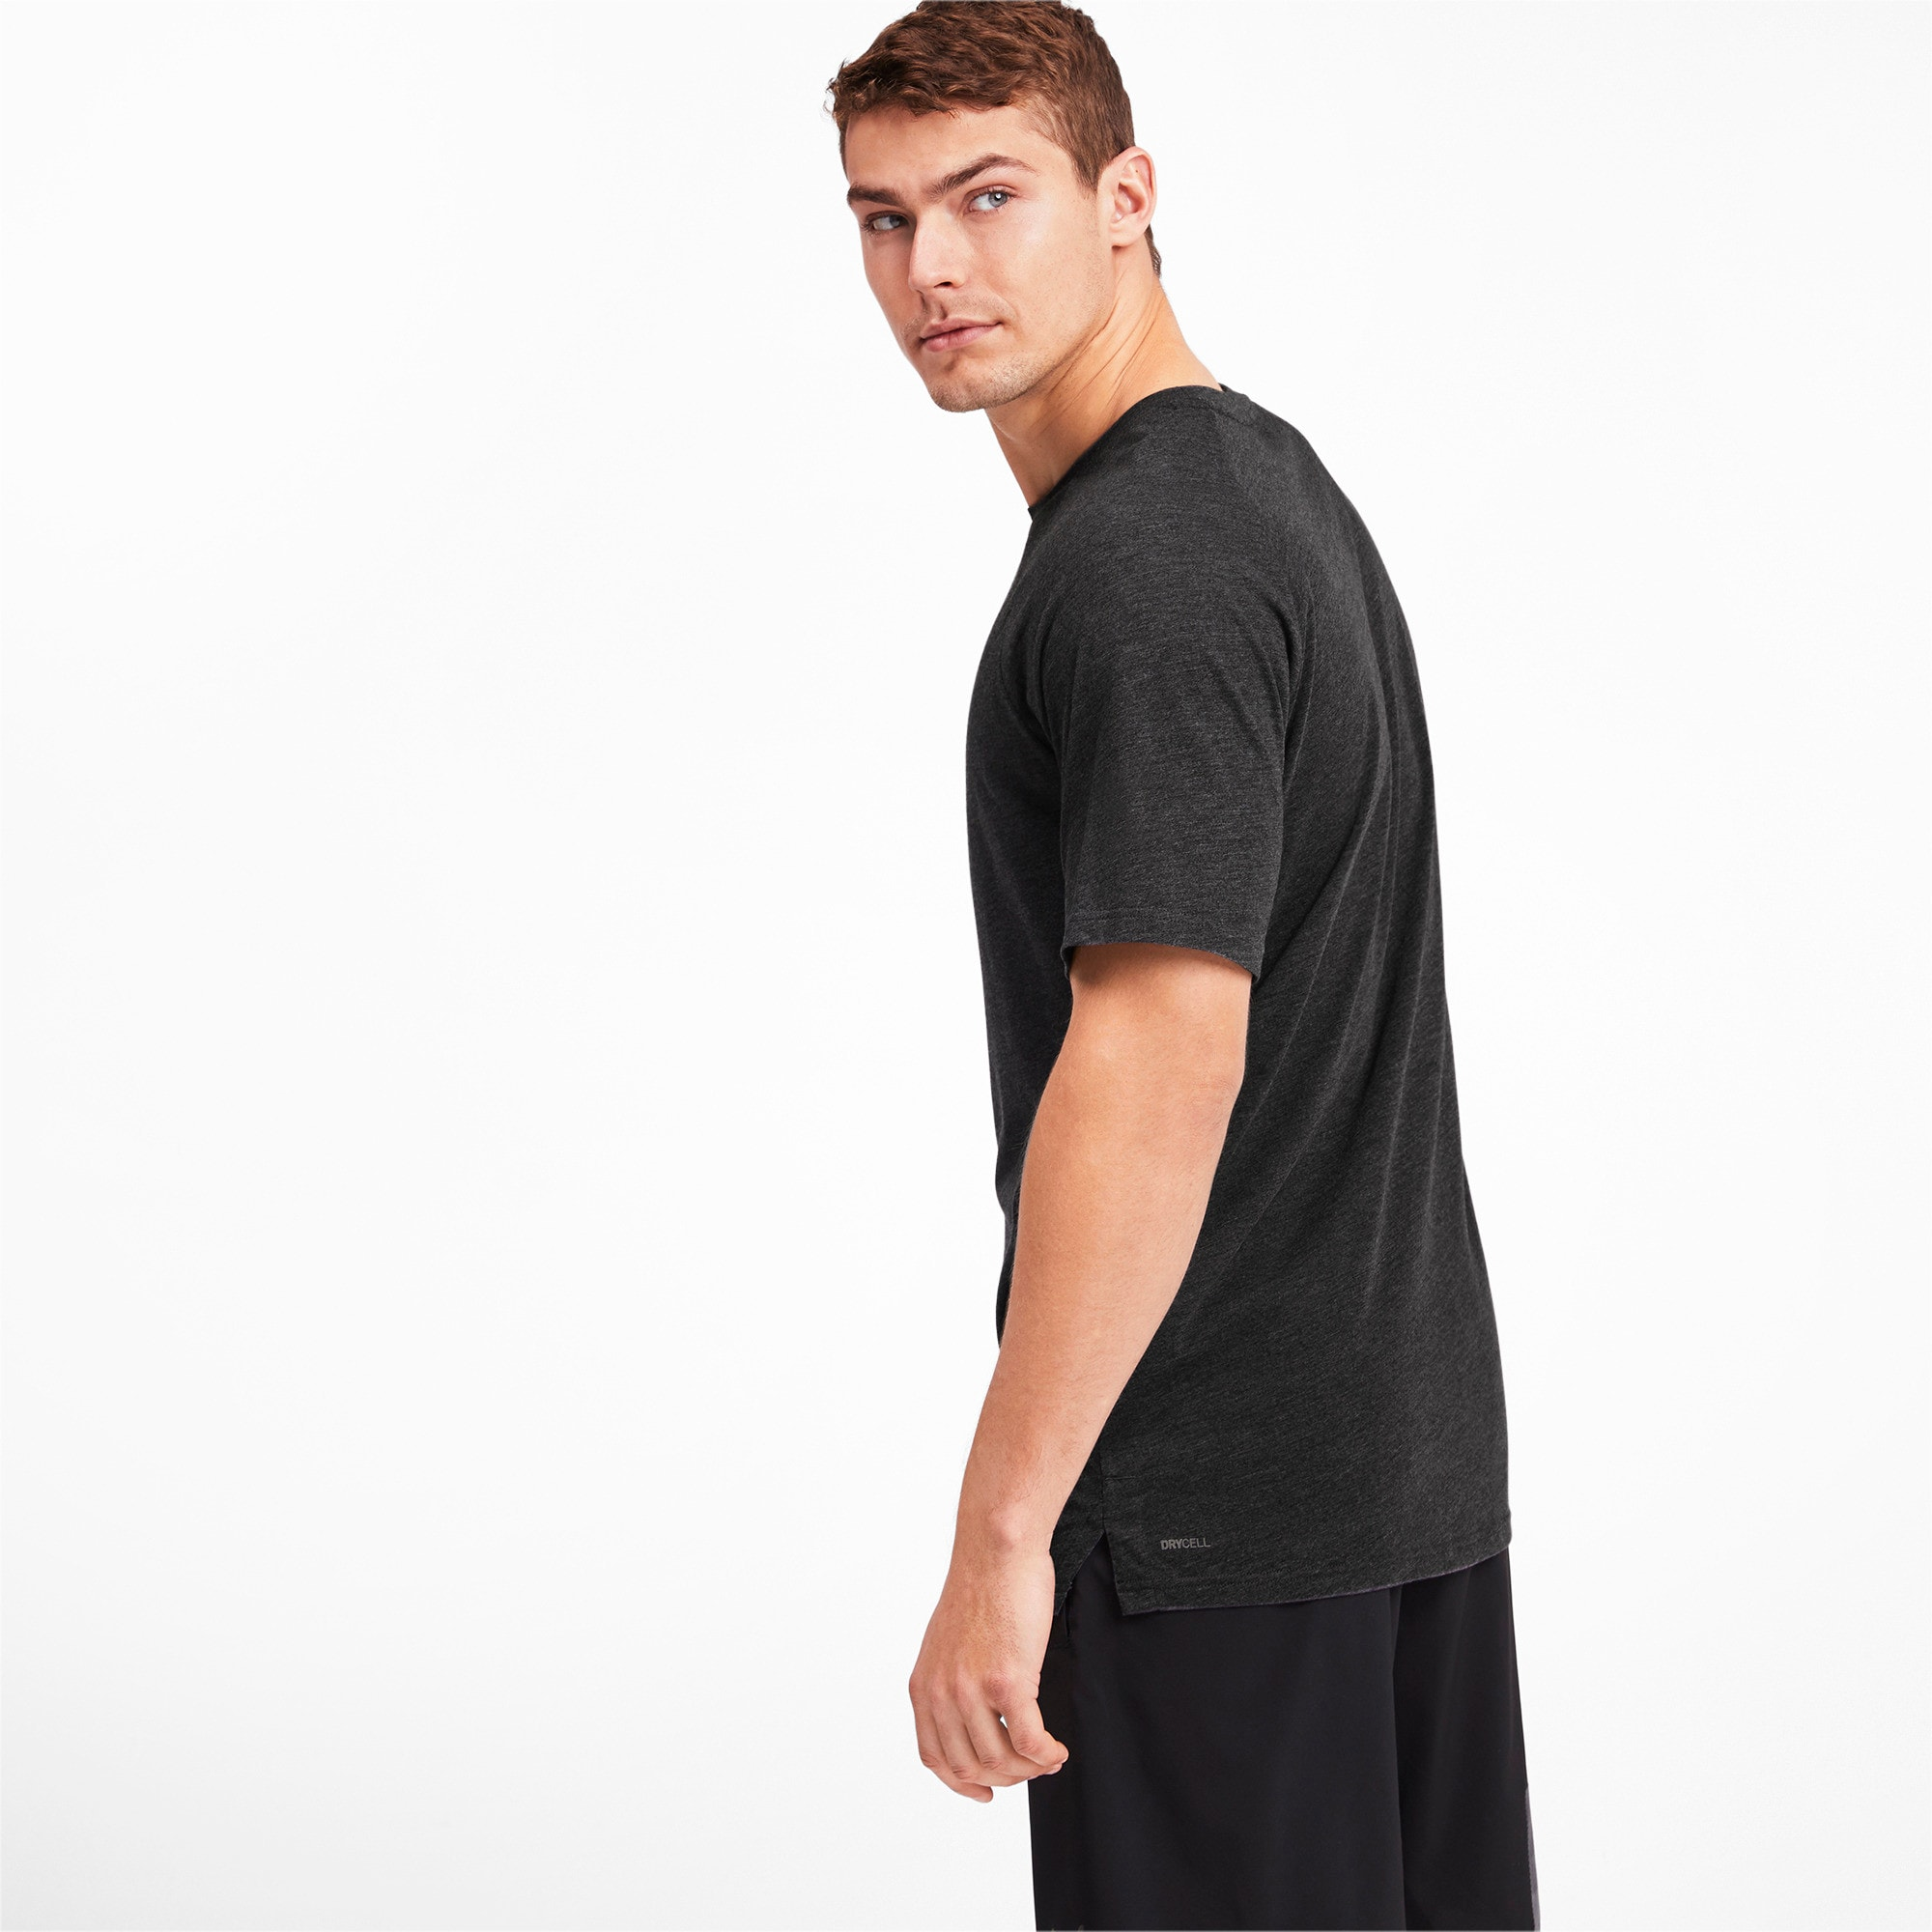 Thumbnail 2 of Meska koszulka Reactive treningowa z krótkim rekawem, Puma Black Heather, medium